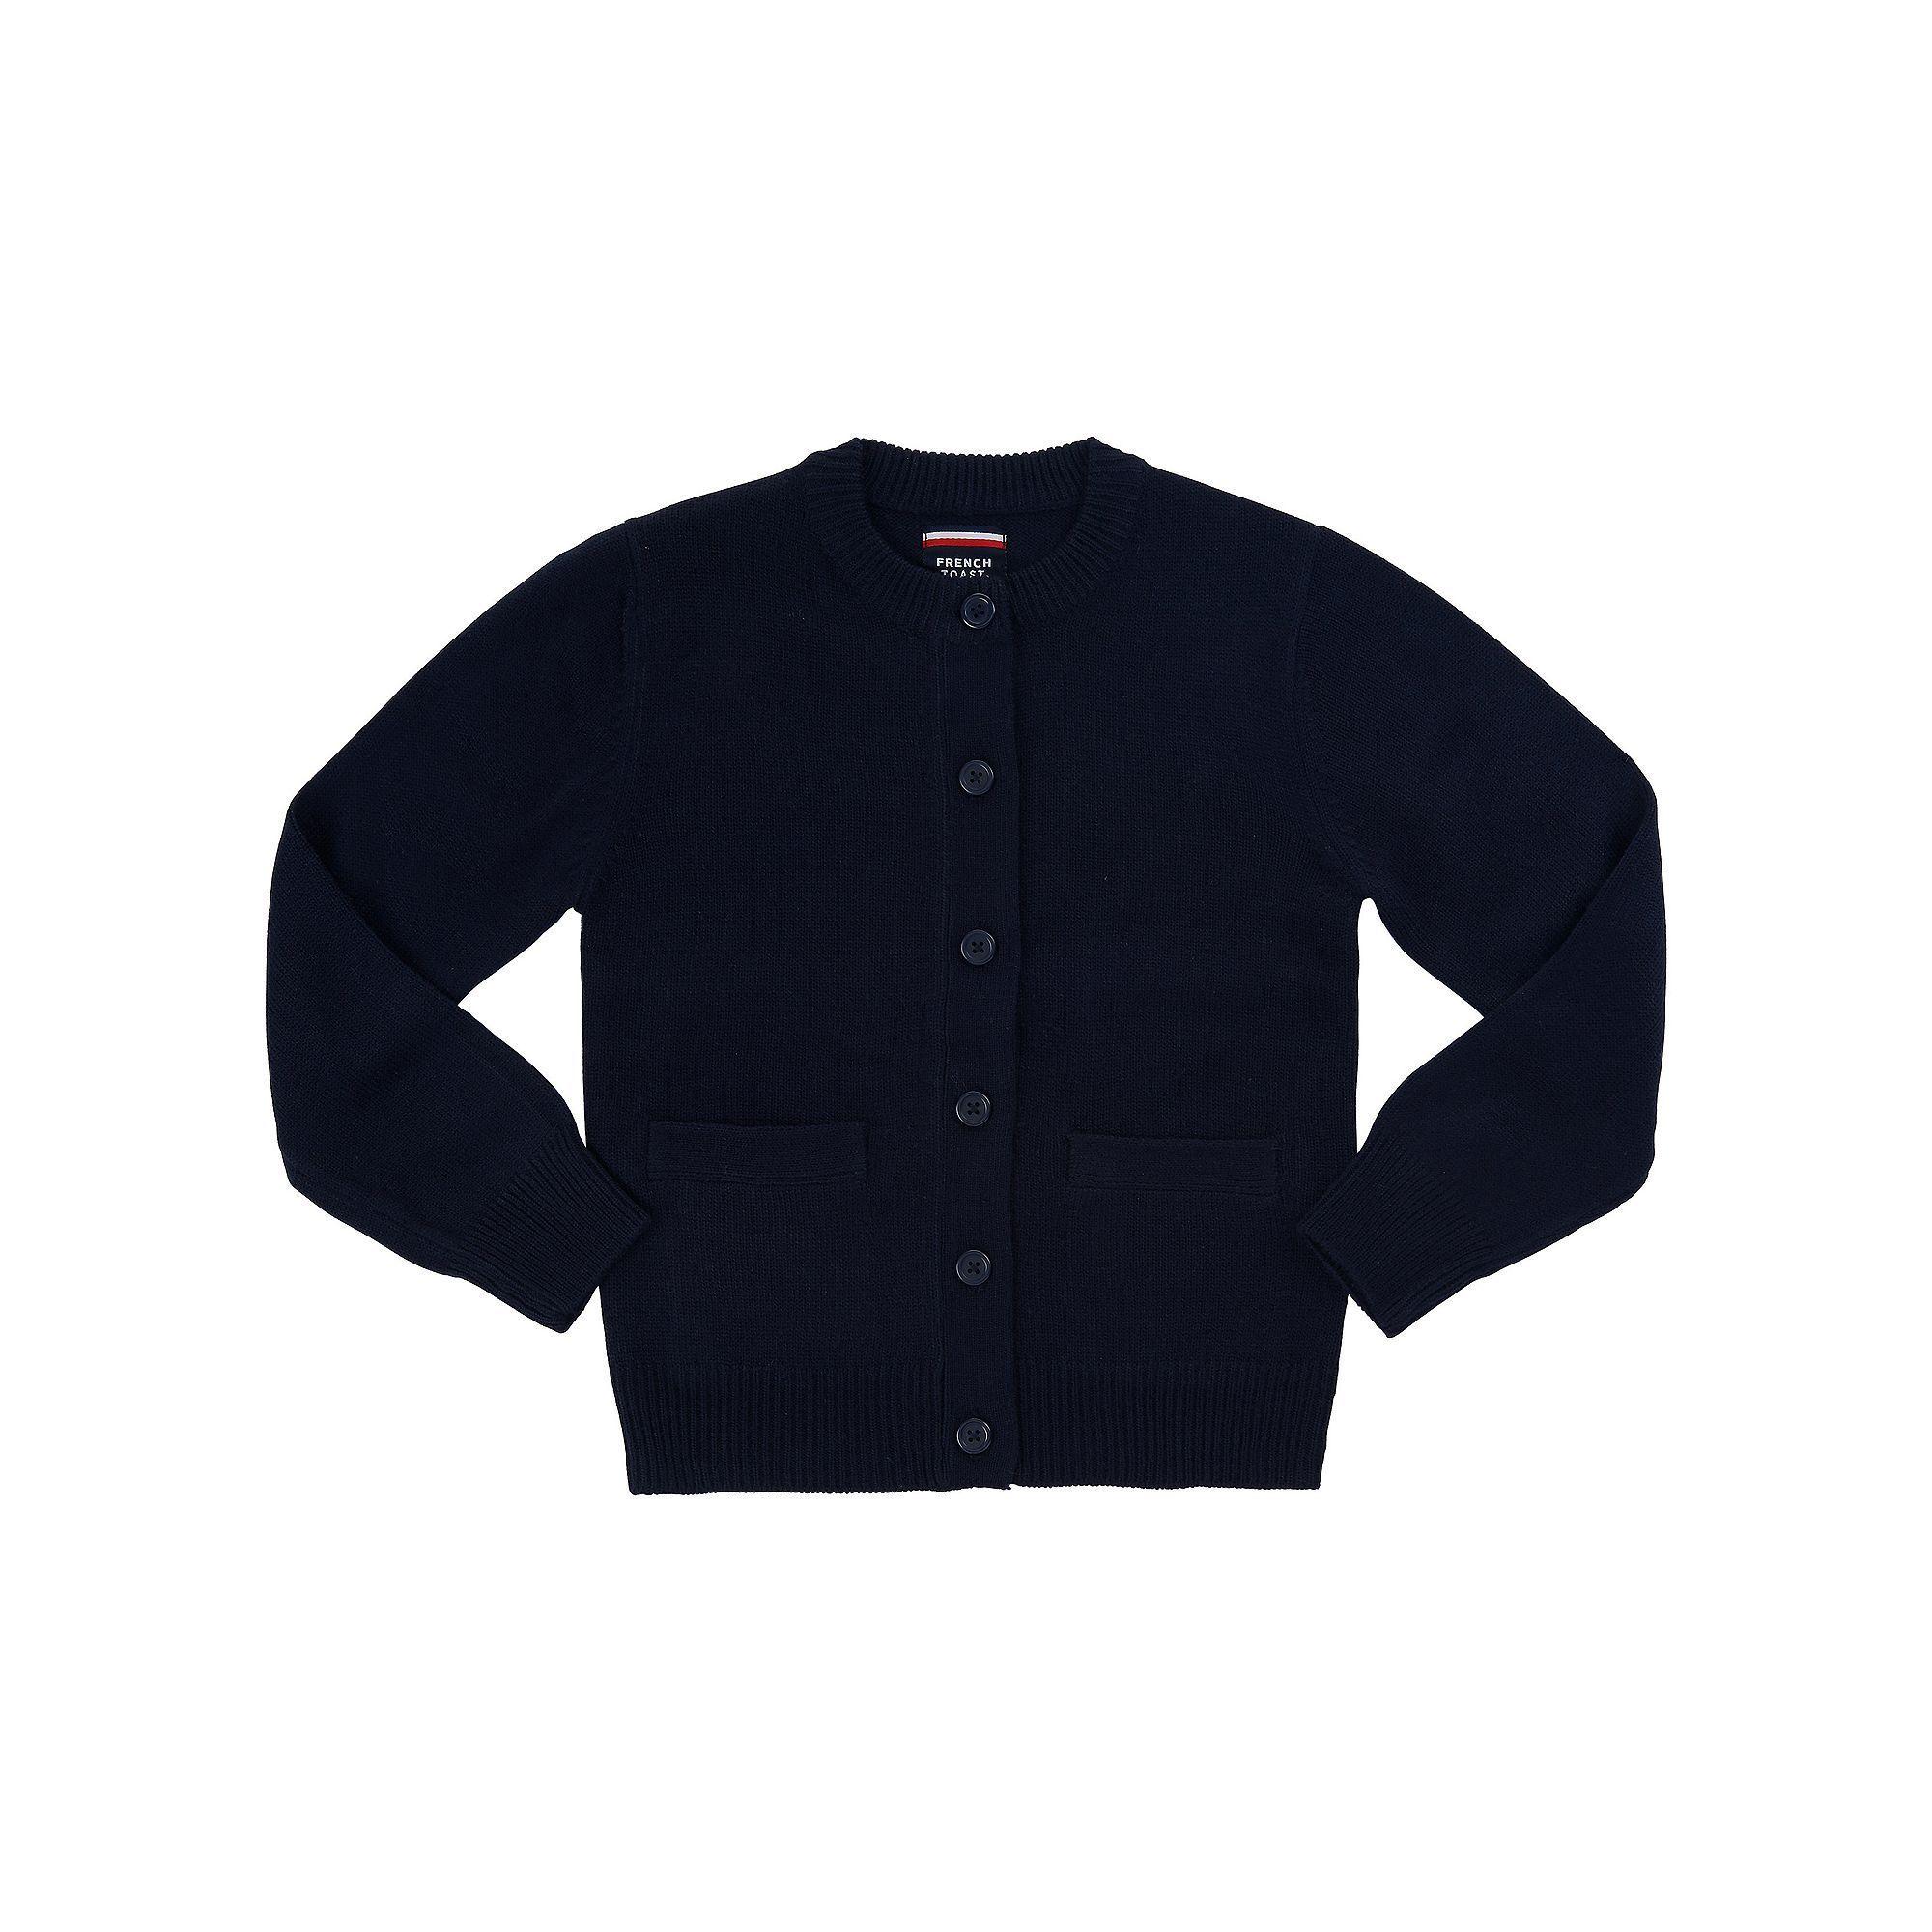 4fa5ba28cb3 Toddler Girl French Toast School Uniform Cardigan | Products ...